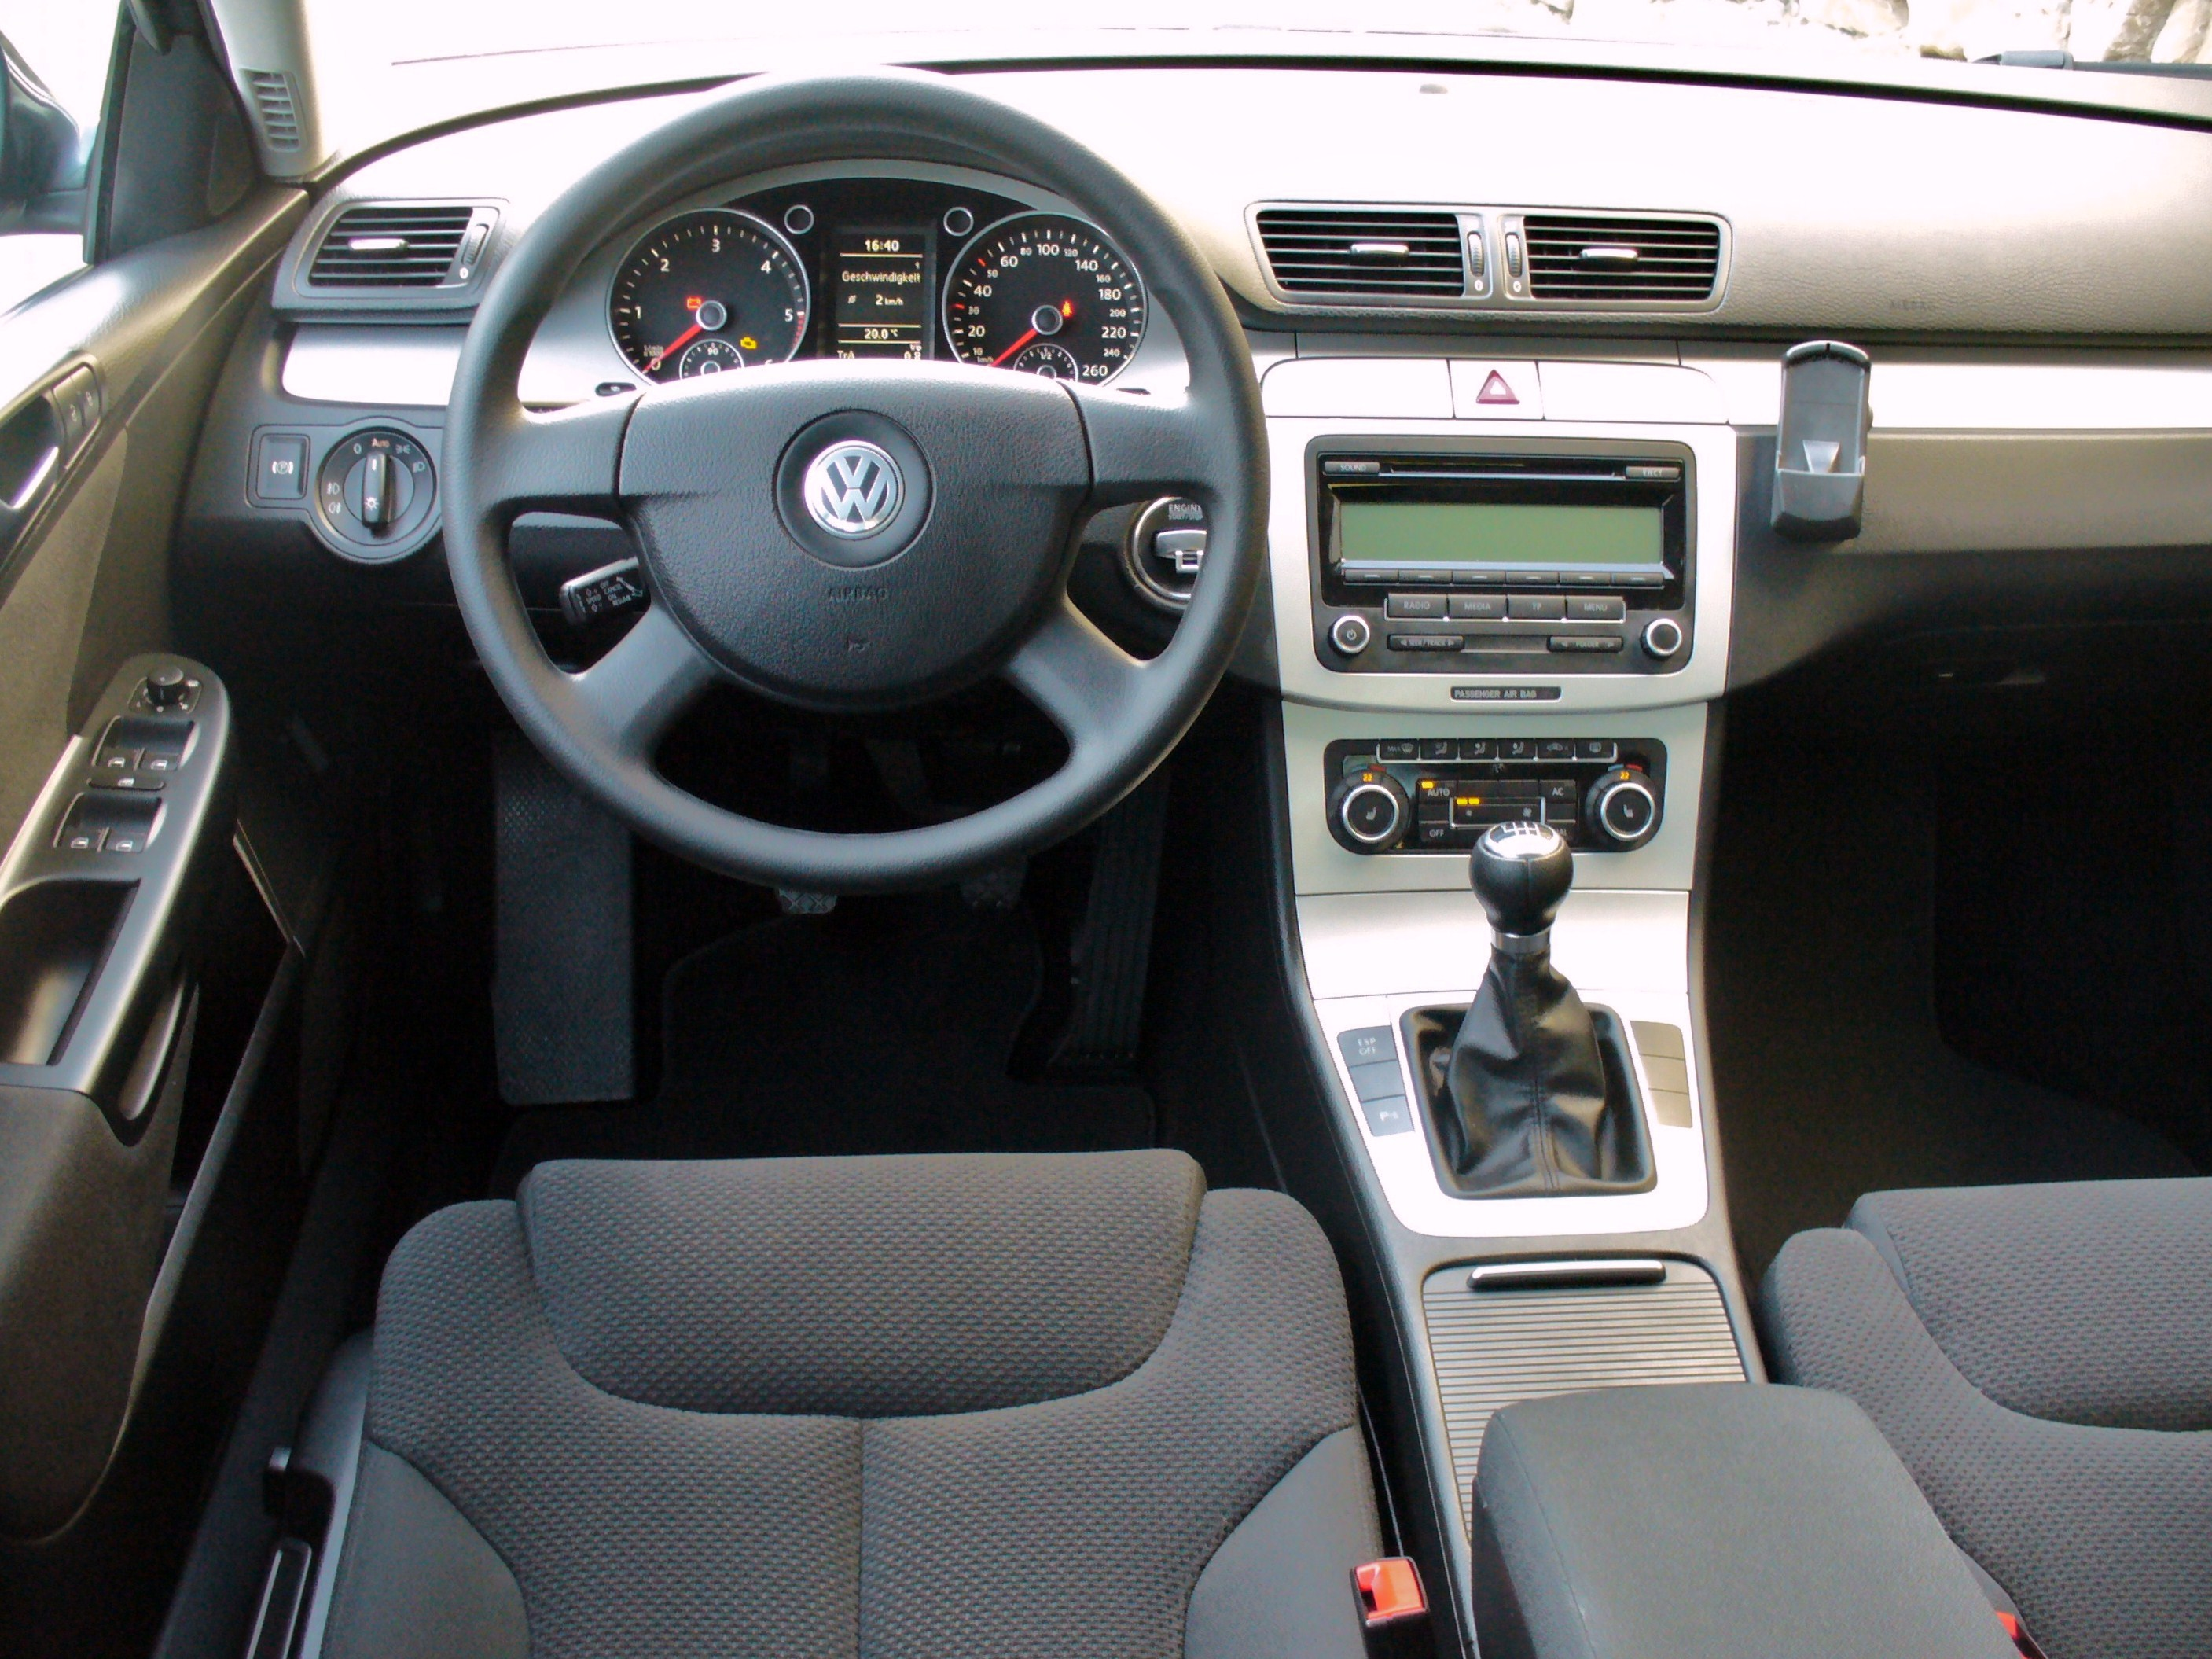 File:VW Passat B6 Comfortline 2.0 TDI Islandgrau Interieur.JPG ...